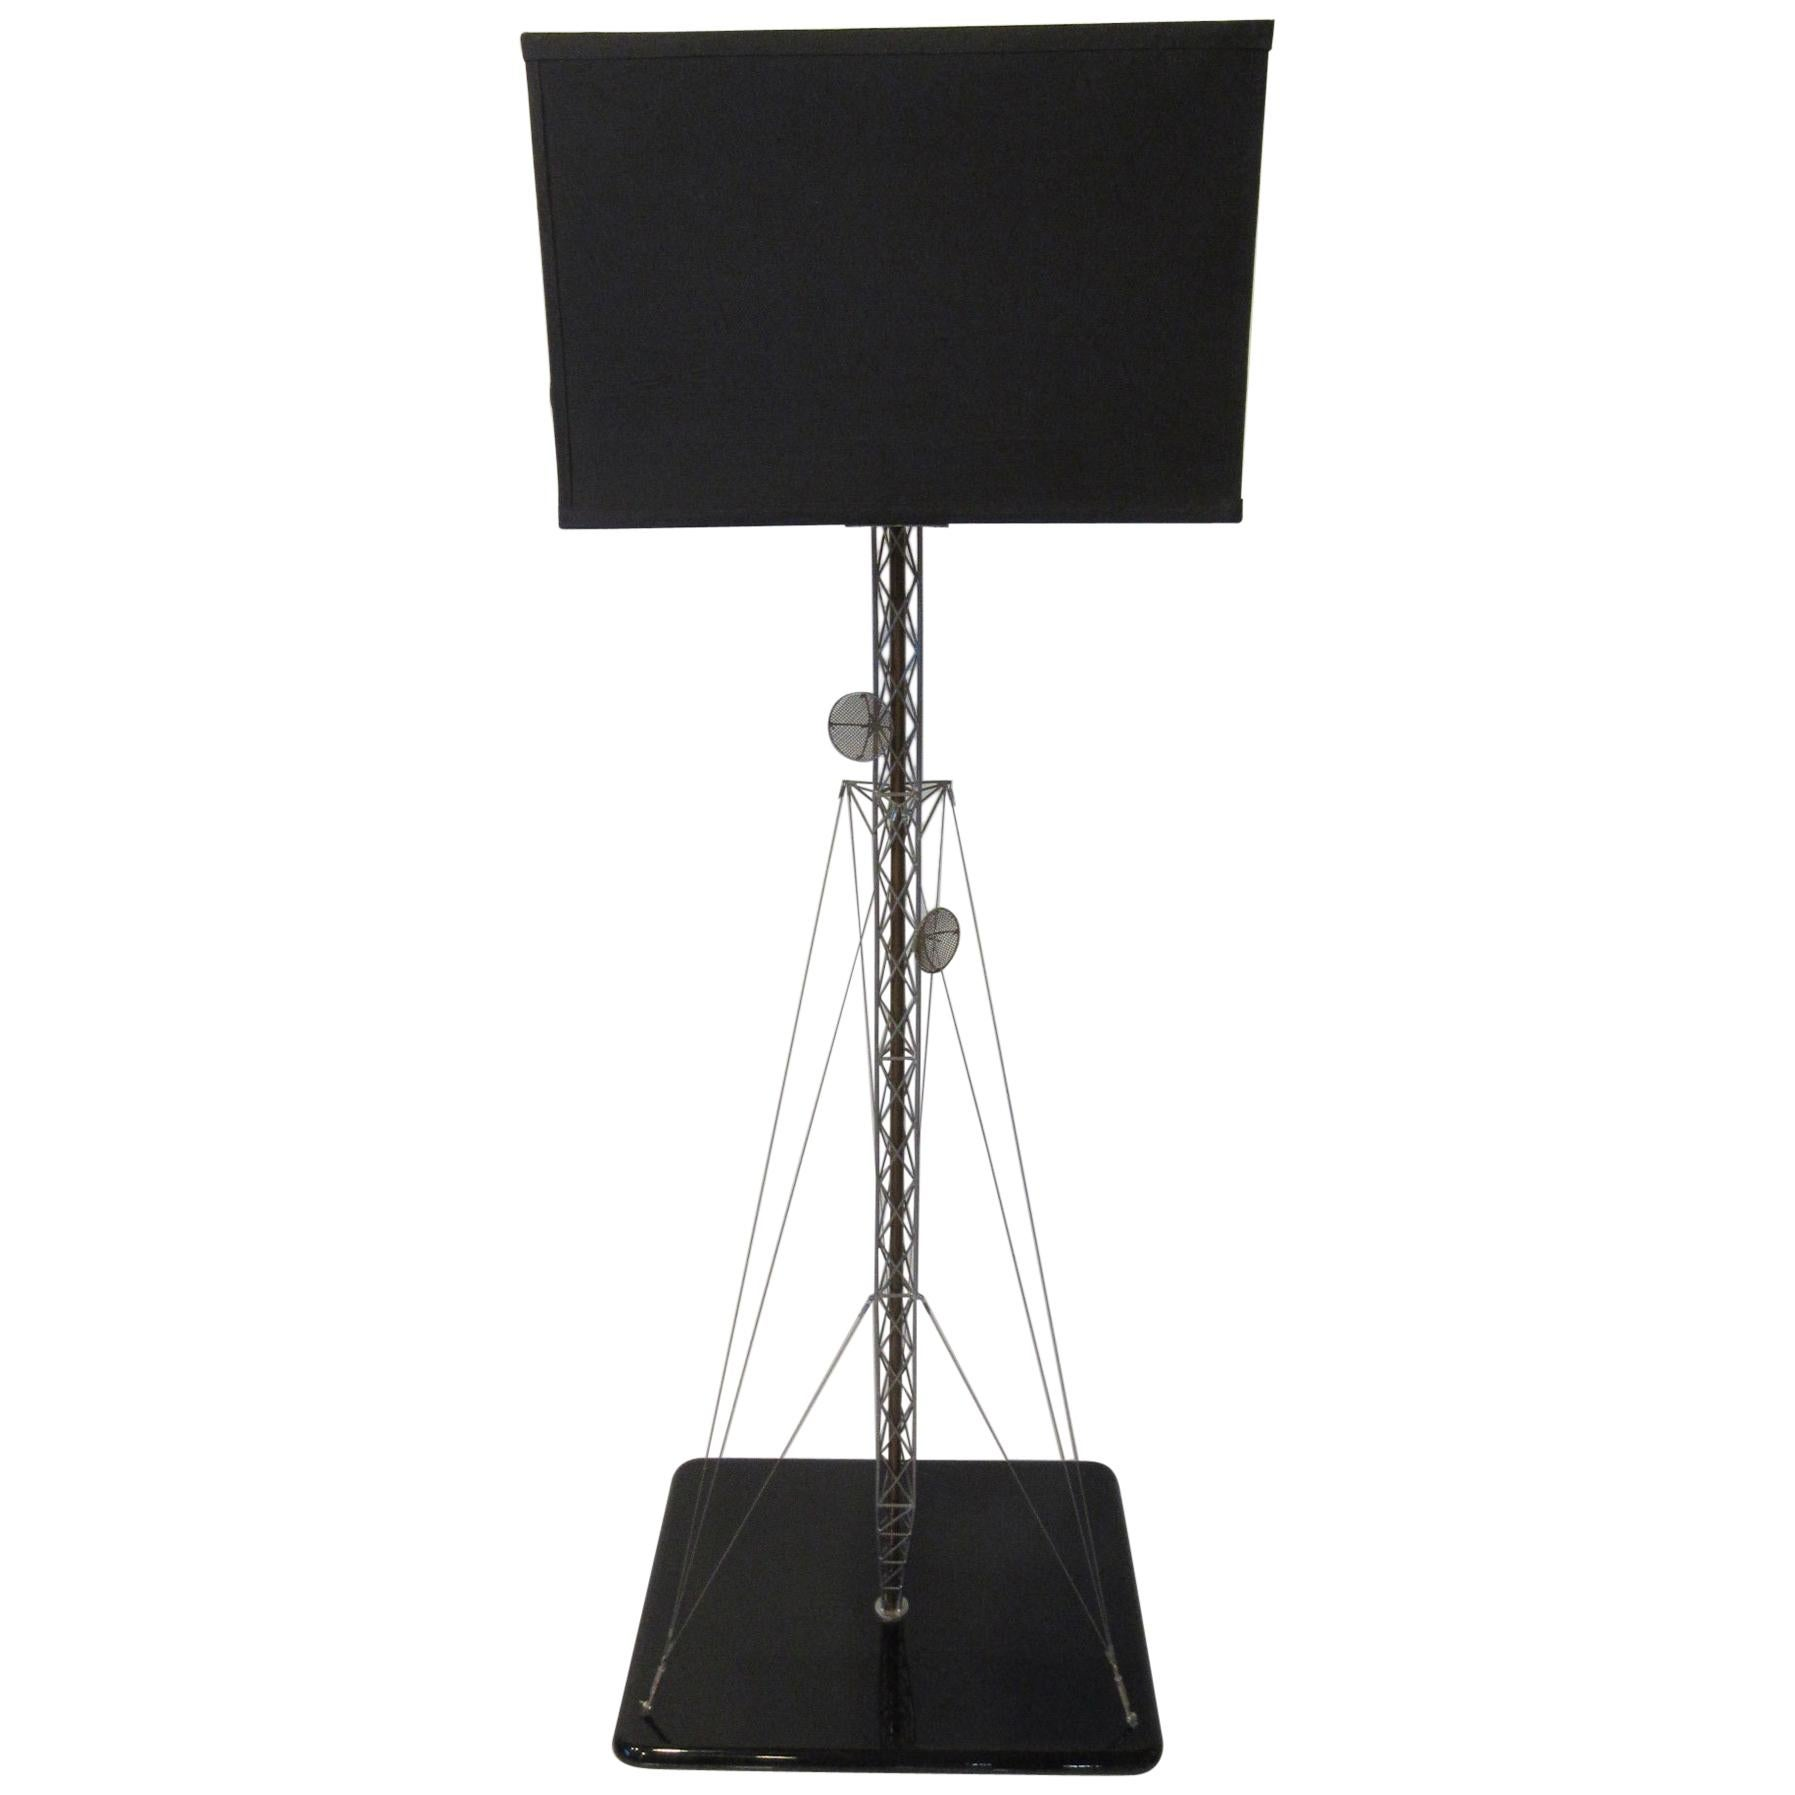 WKRP Salesman's Sample Radio Tower Lamp